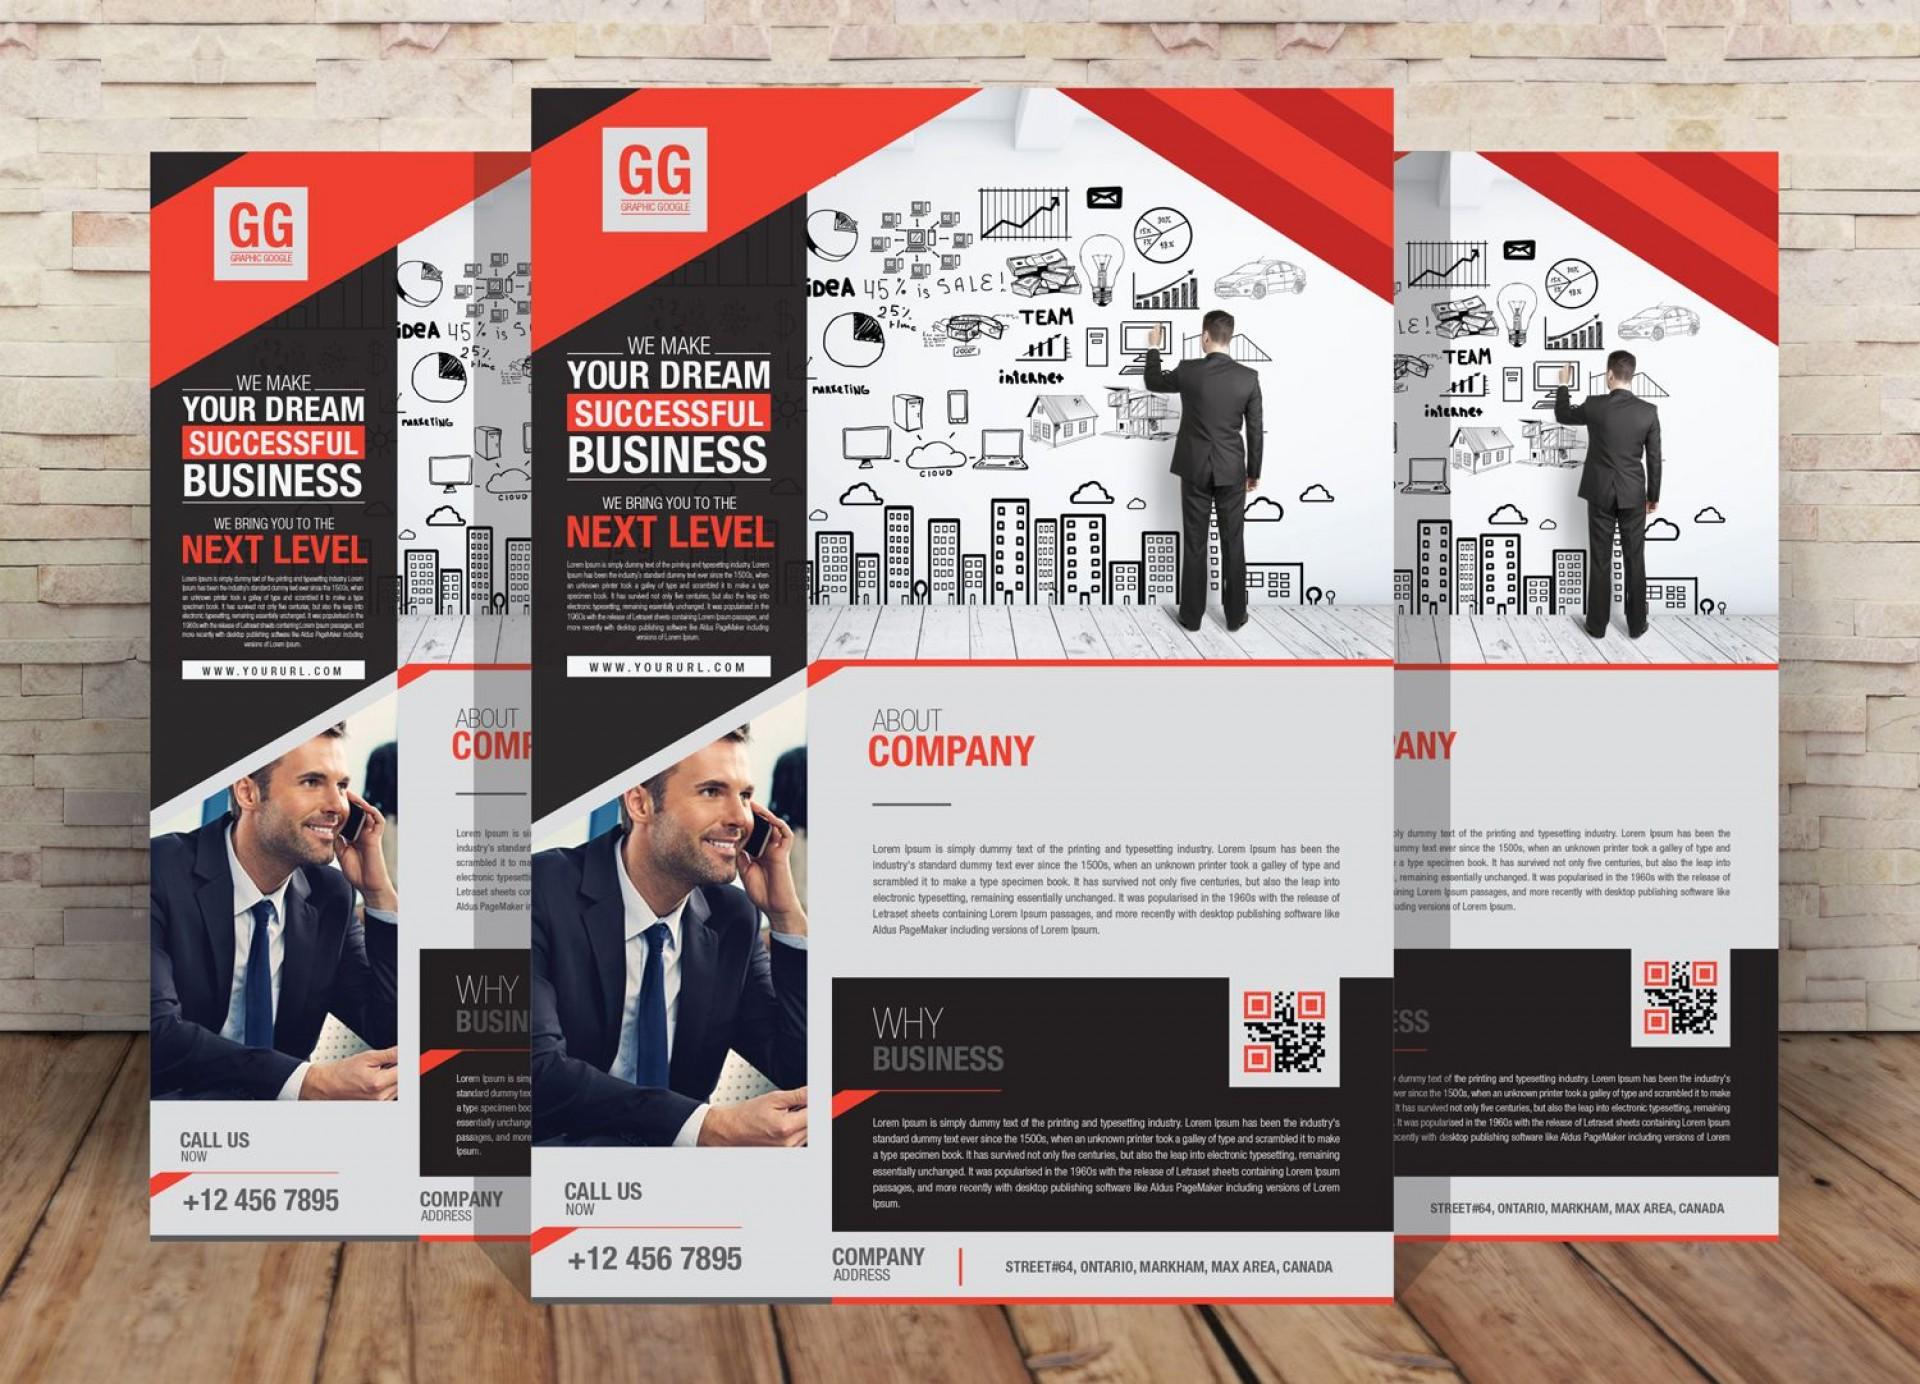 008 Beautiful Free Flyer Design Template Idea  Templates Online Download Psd1920